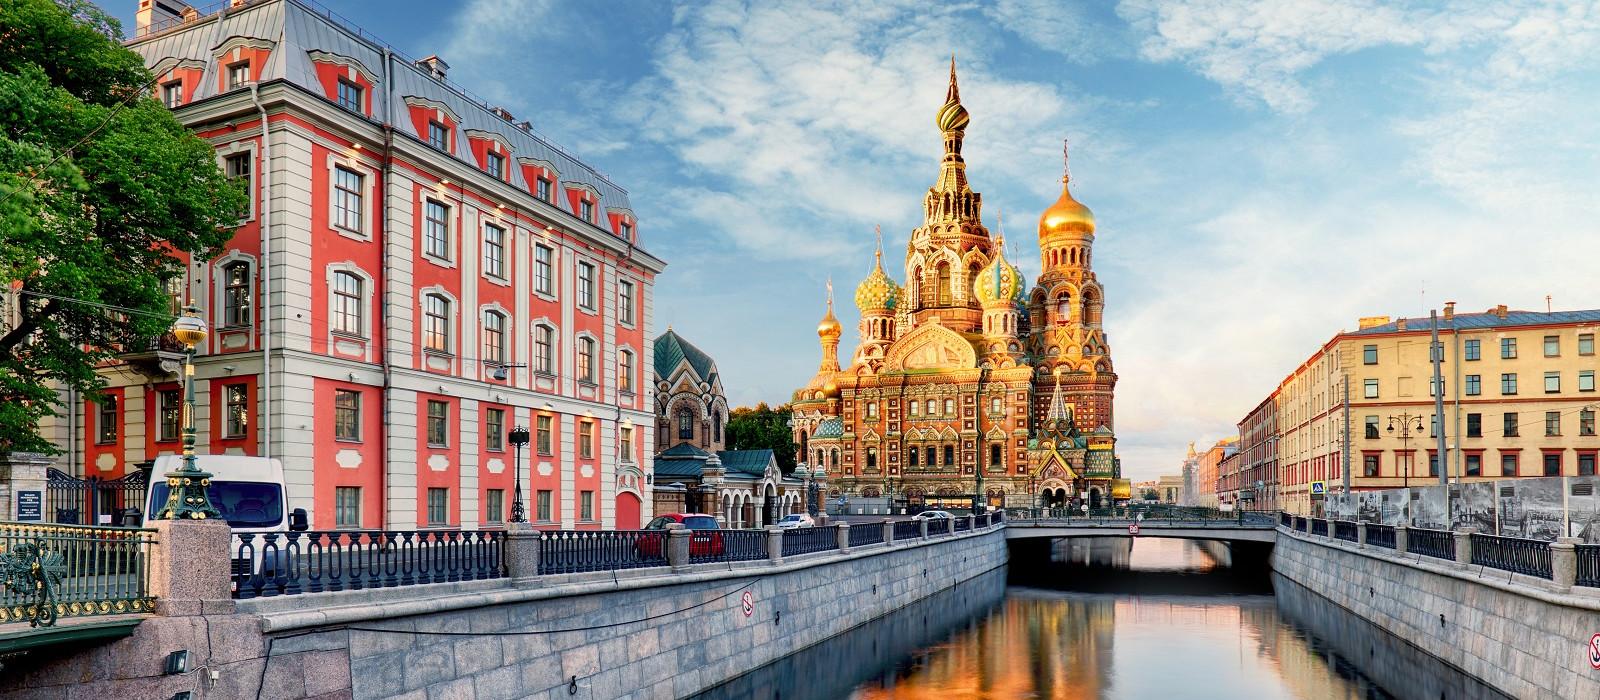 Russland: St. Petersburg & Karelien Urlaub 1